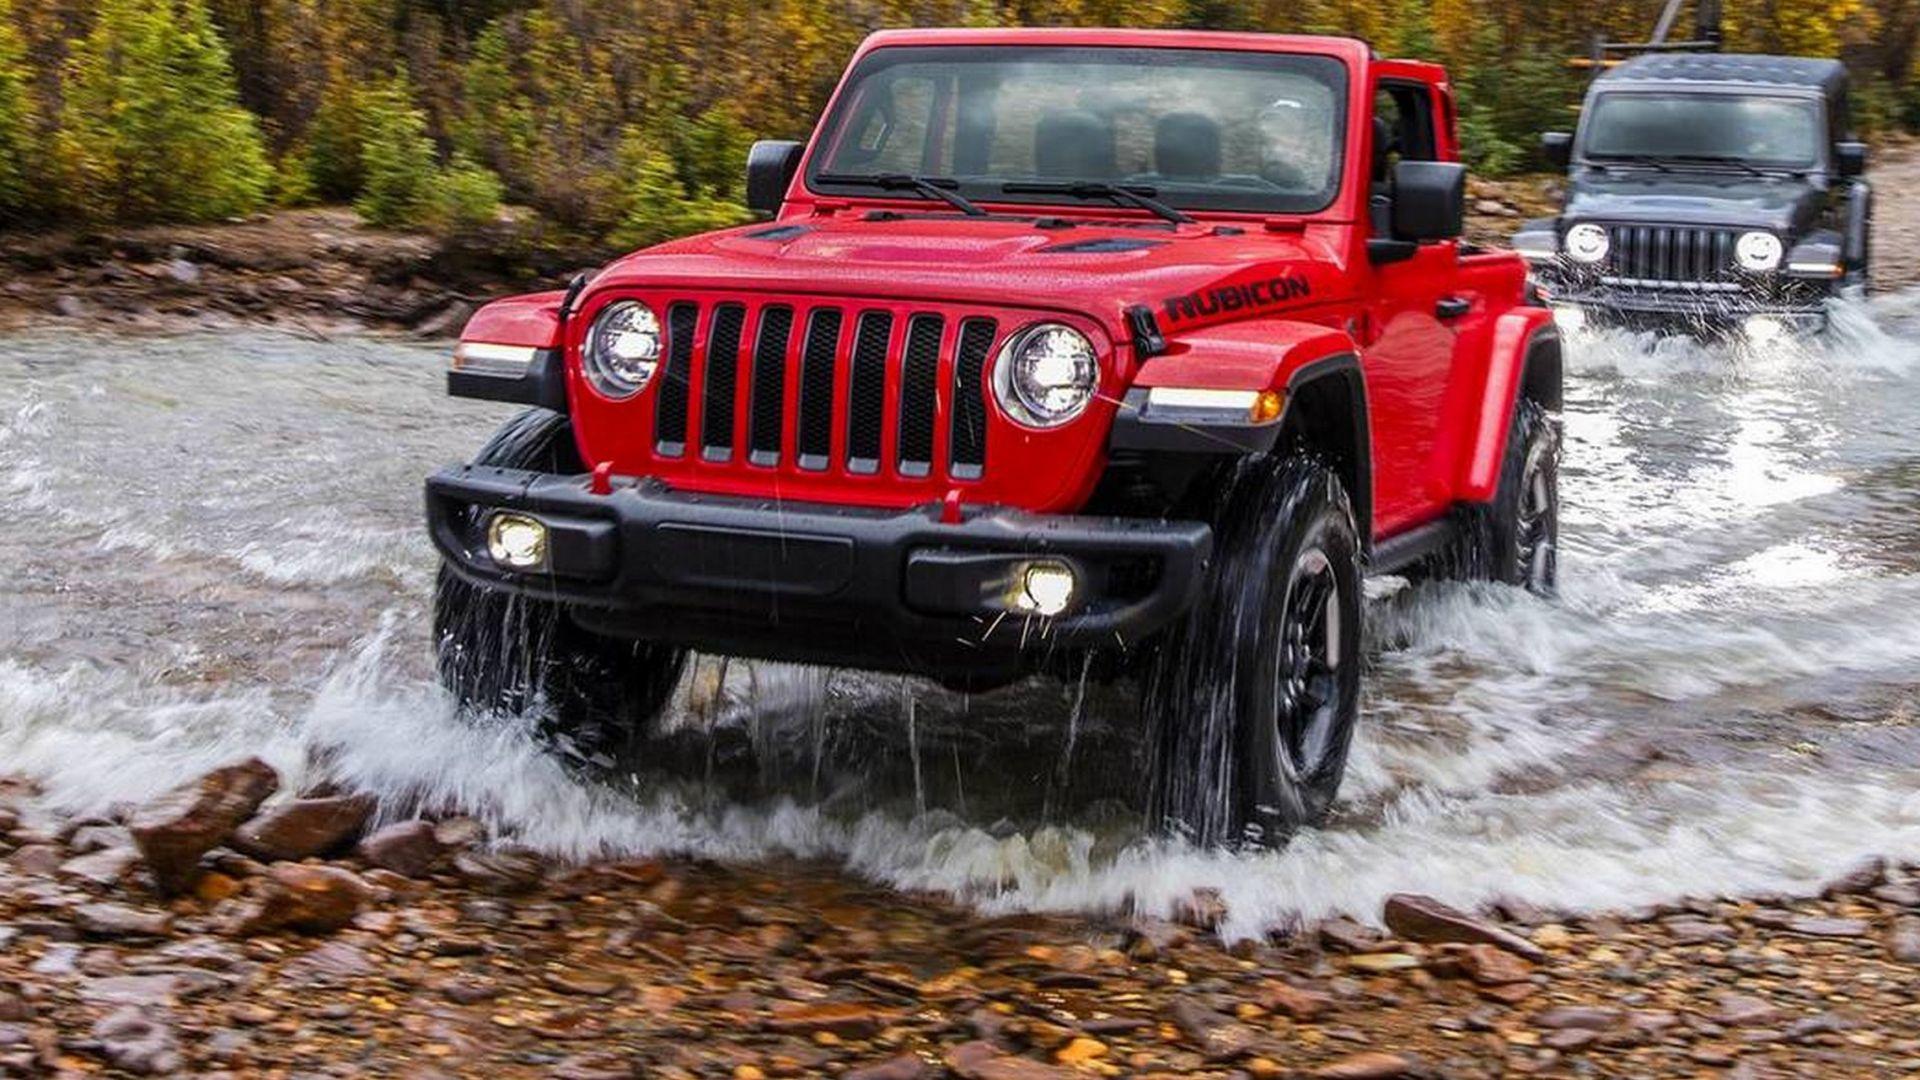 Jeep Wrangler 2018 Prezzo >> Nuova Jeep Wrangler 2018: prova, prestazioni, prezzi, motori - MotorBox